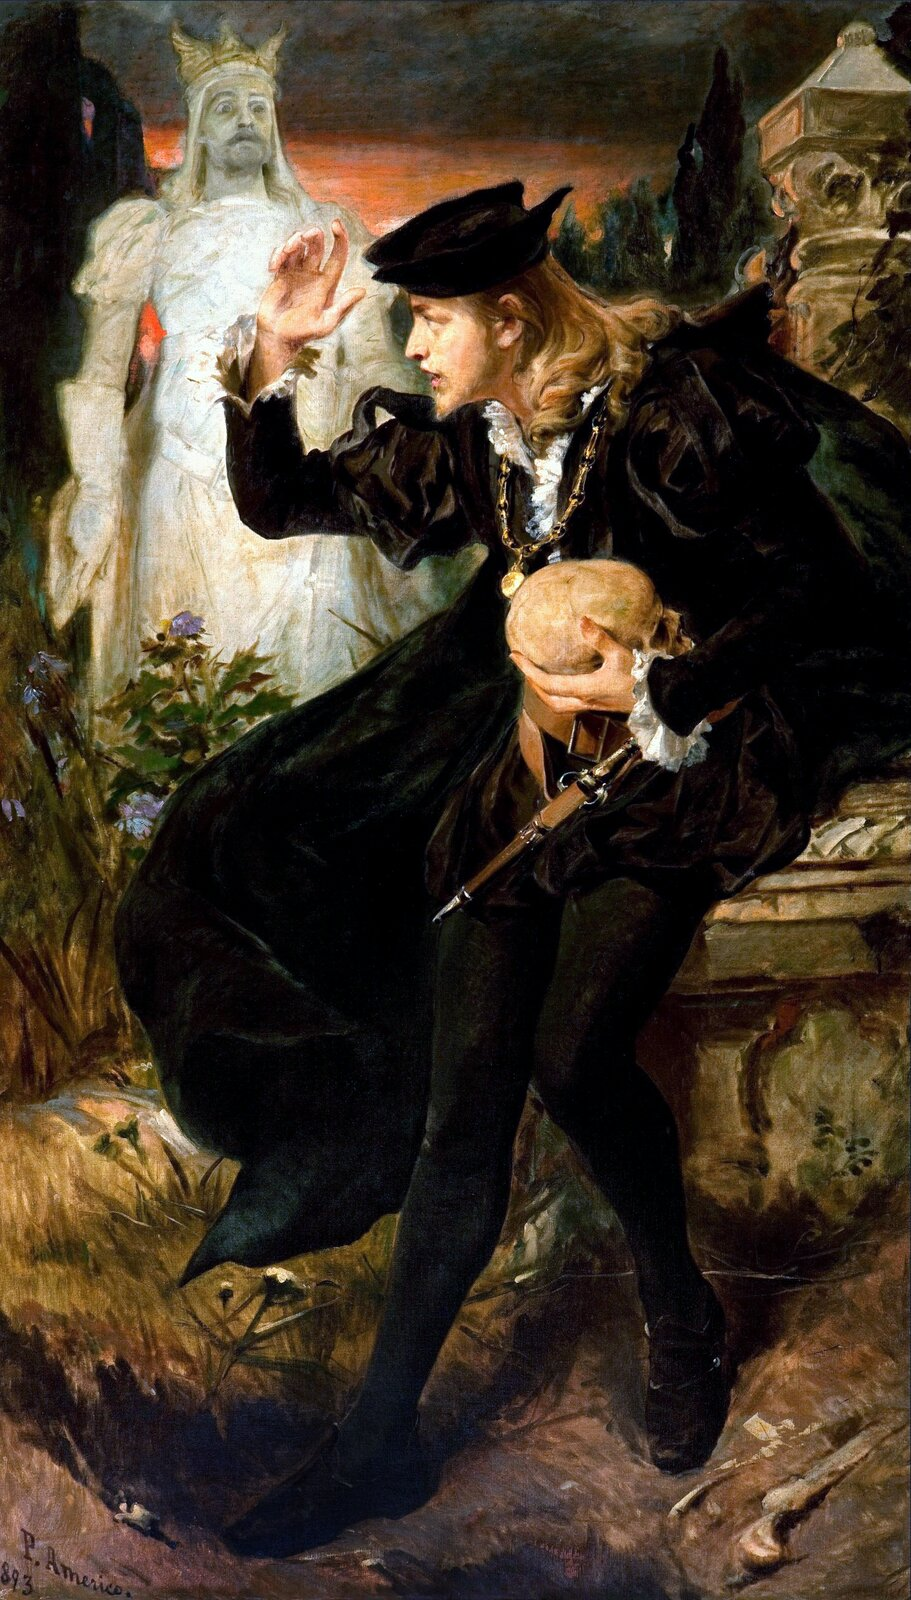 Wizja Hamleta Źródło: Pedro Américo, Wizja Hamleta, 1893, olej na płótnie, Pinacoteca do Estado de São Paulo, domena publiczna.